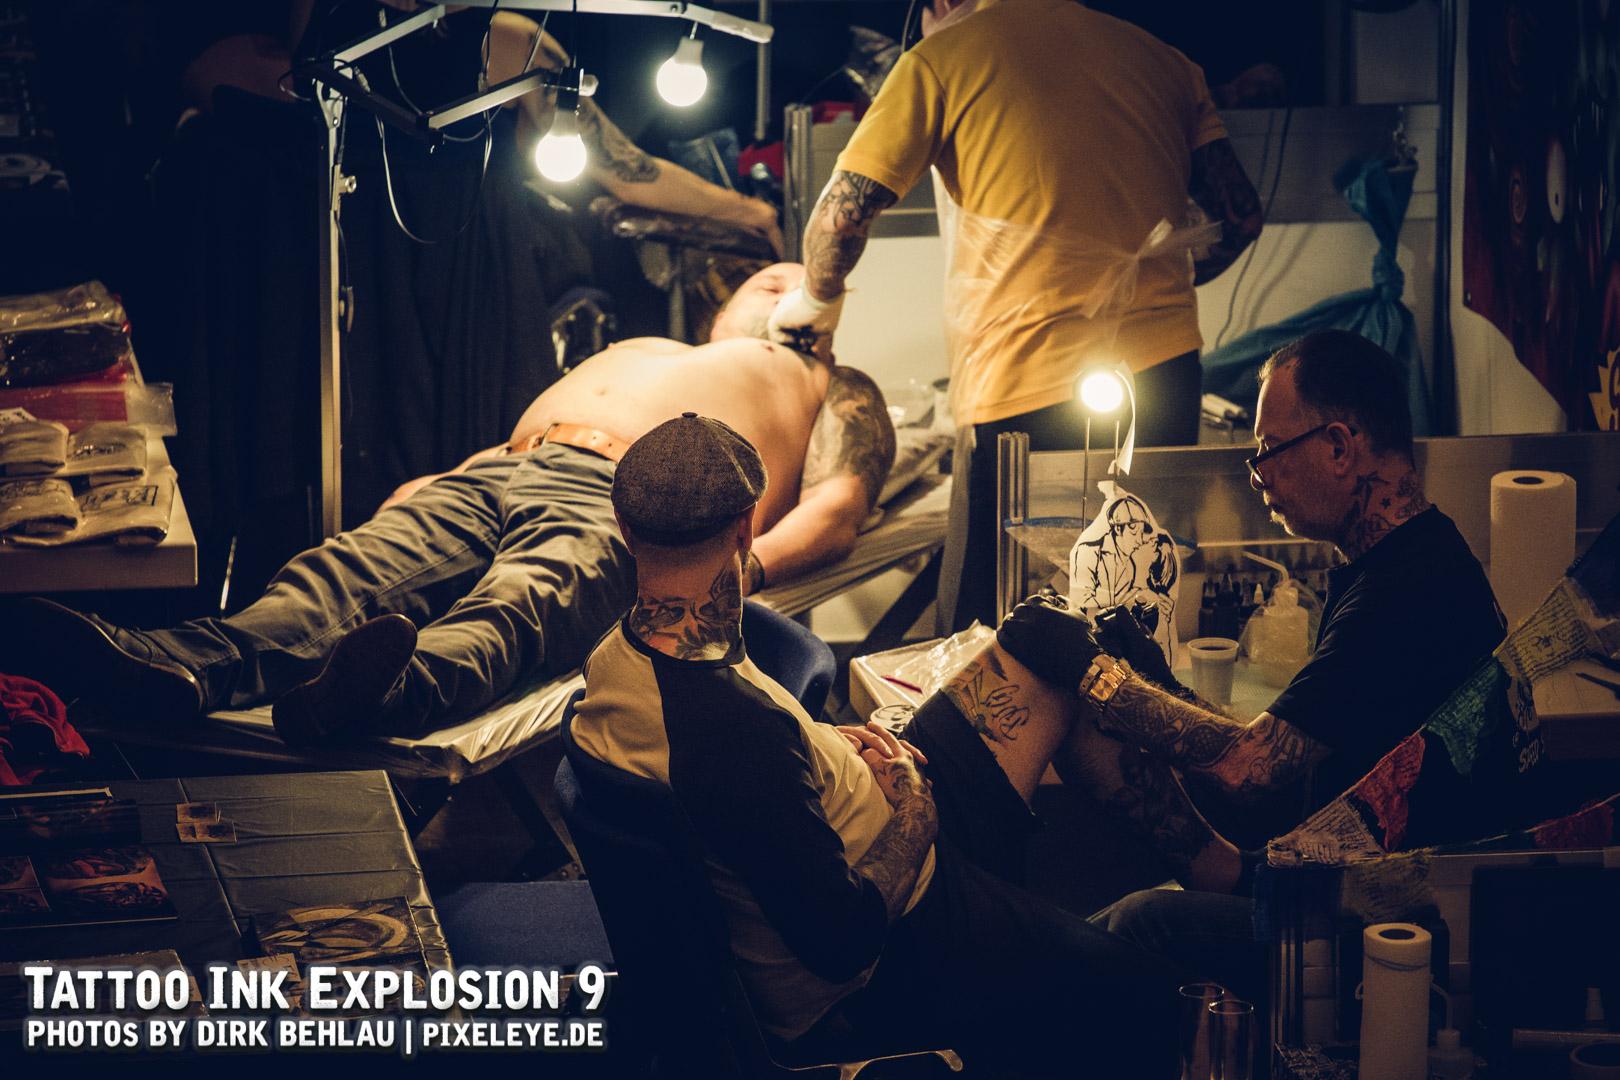 Tattoo Ink Explosion 2018 WEB by Dirk Behlau-1411.jpg